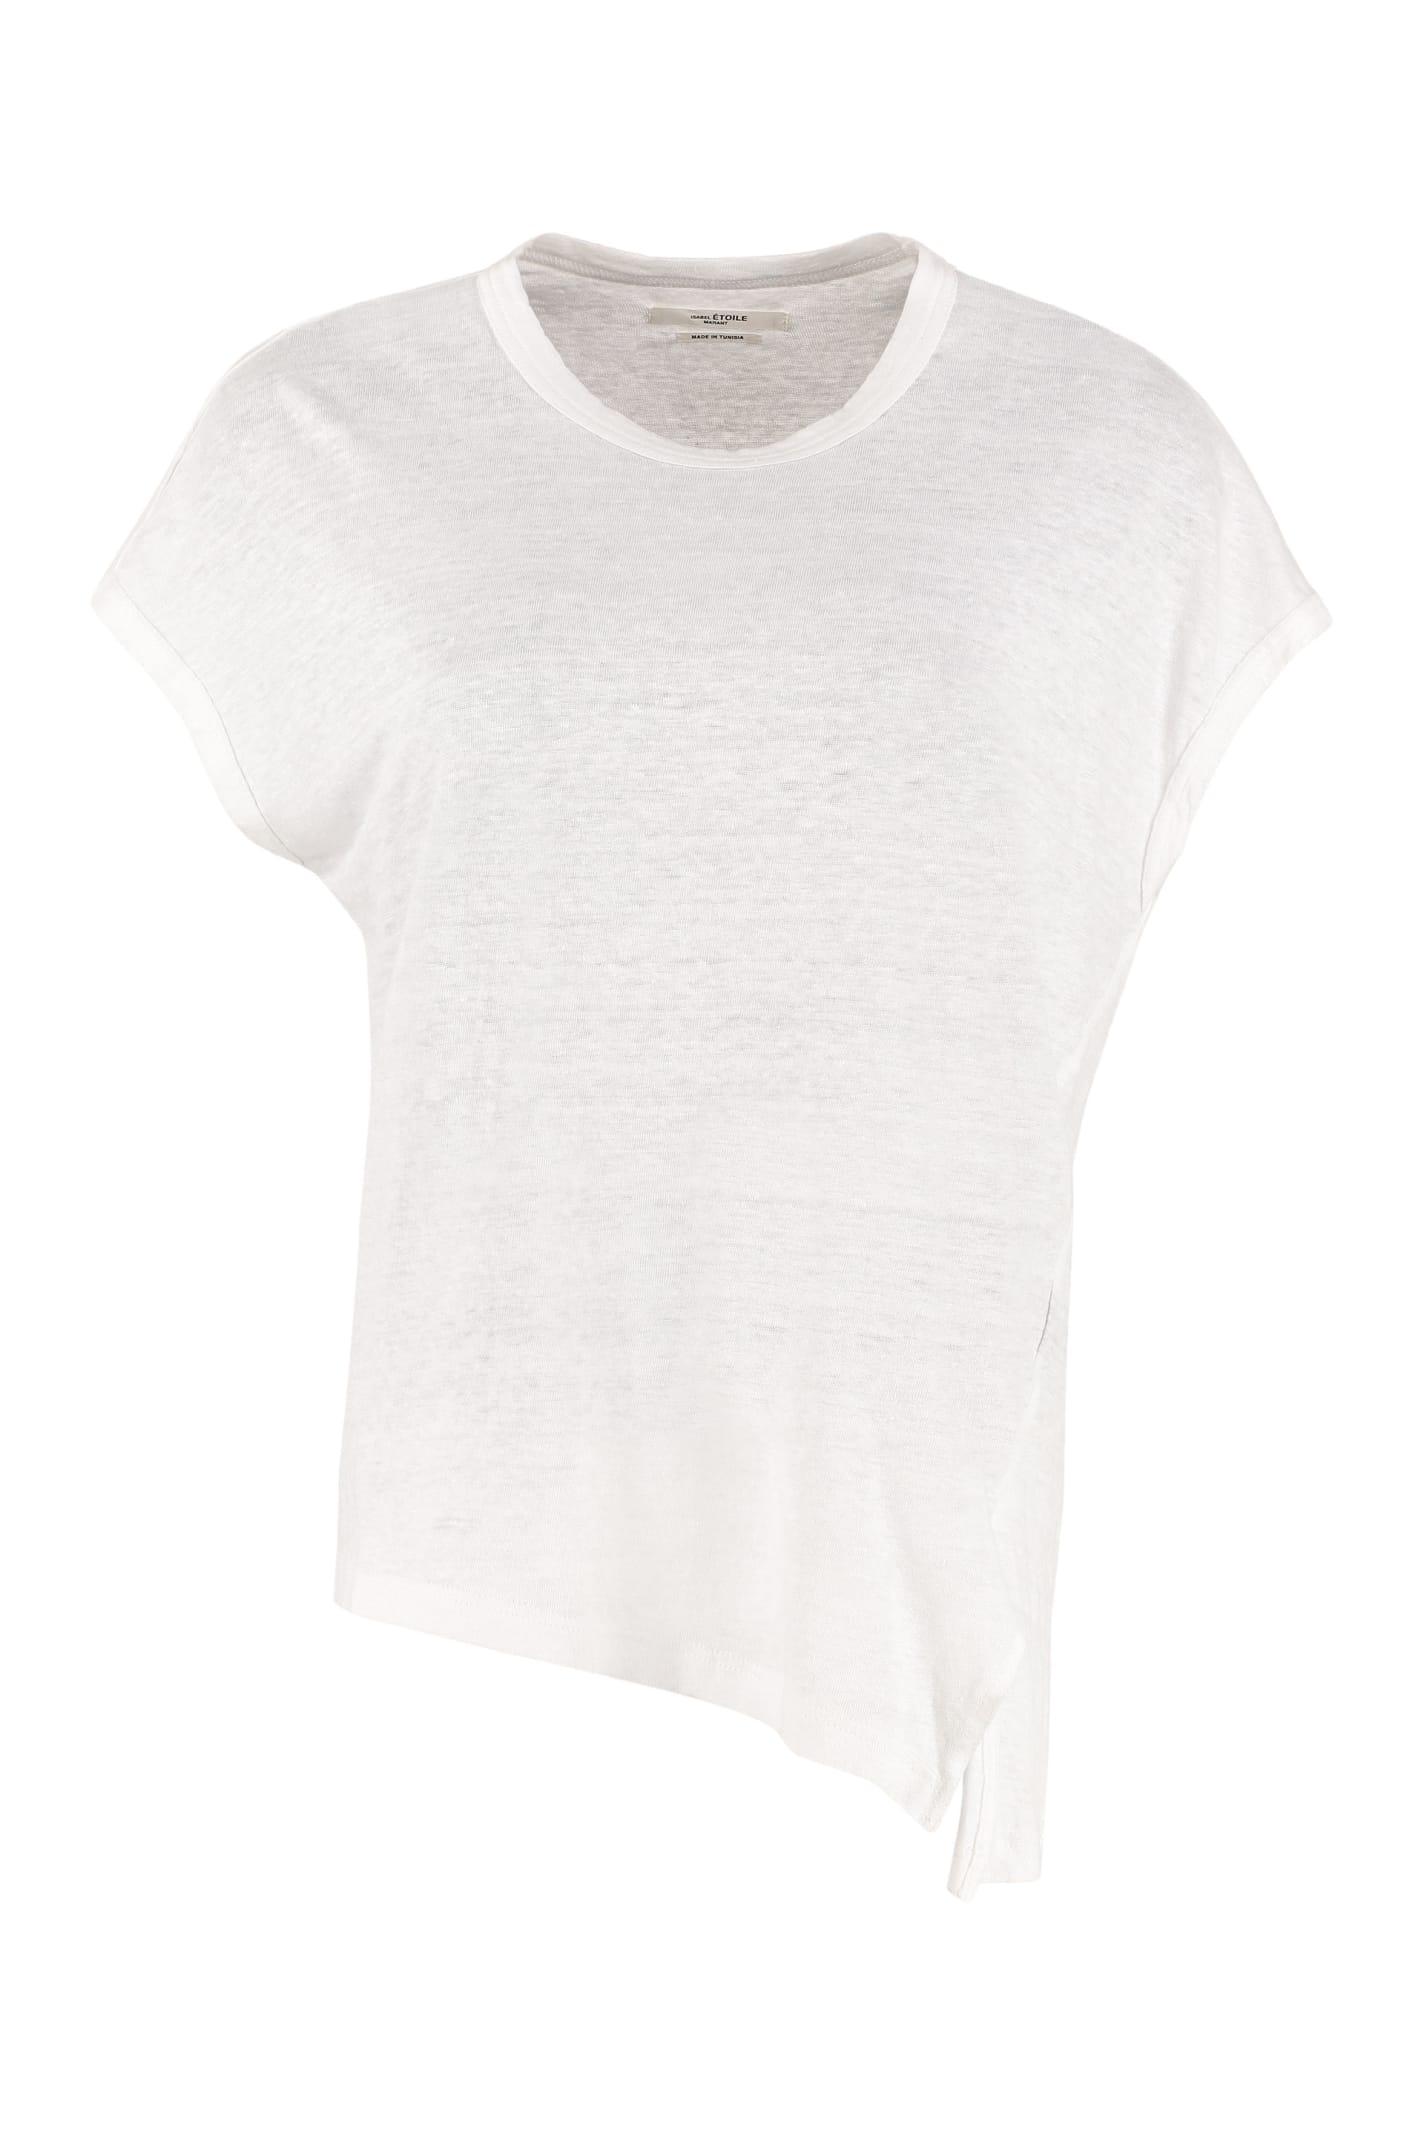 Etoile Isabel Marant T-shirts KELLA LINEN T-SHIRT